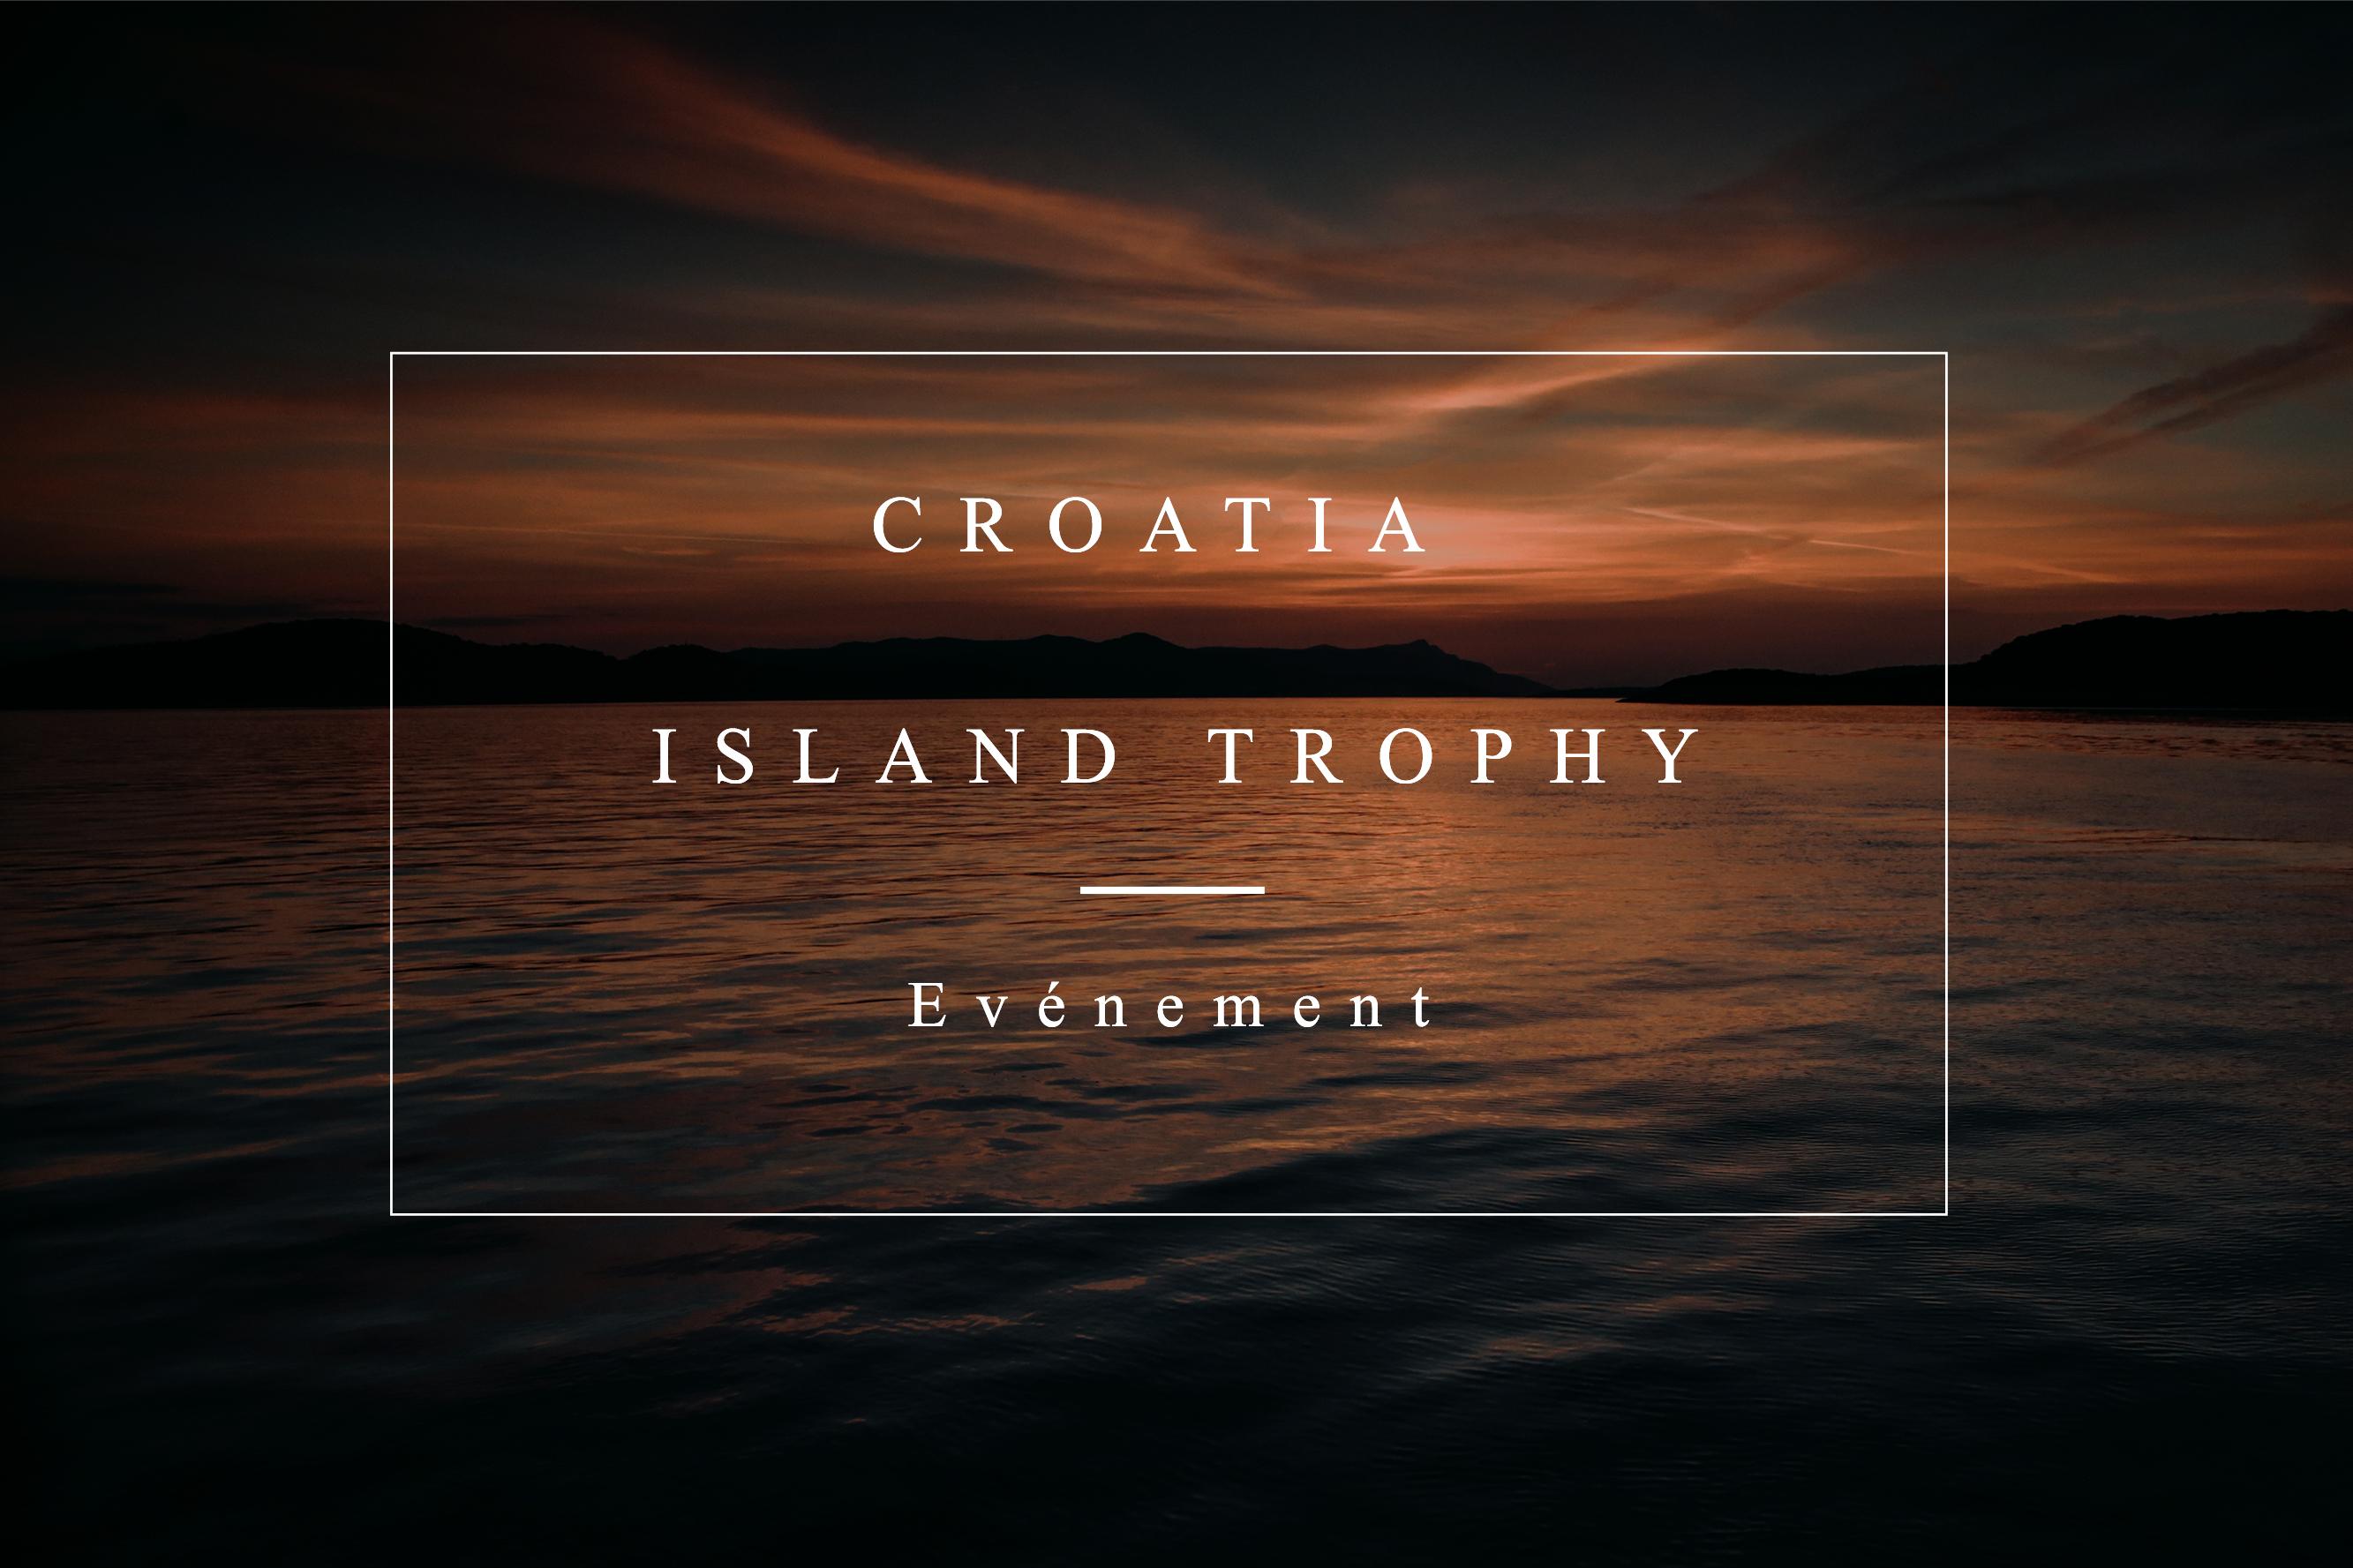 croatia island trophy 2018